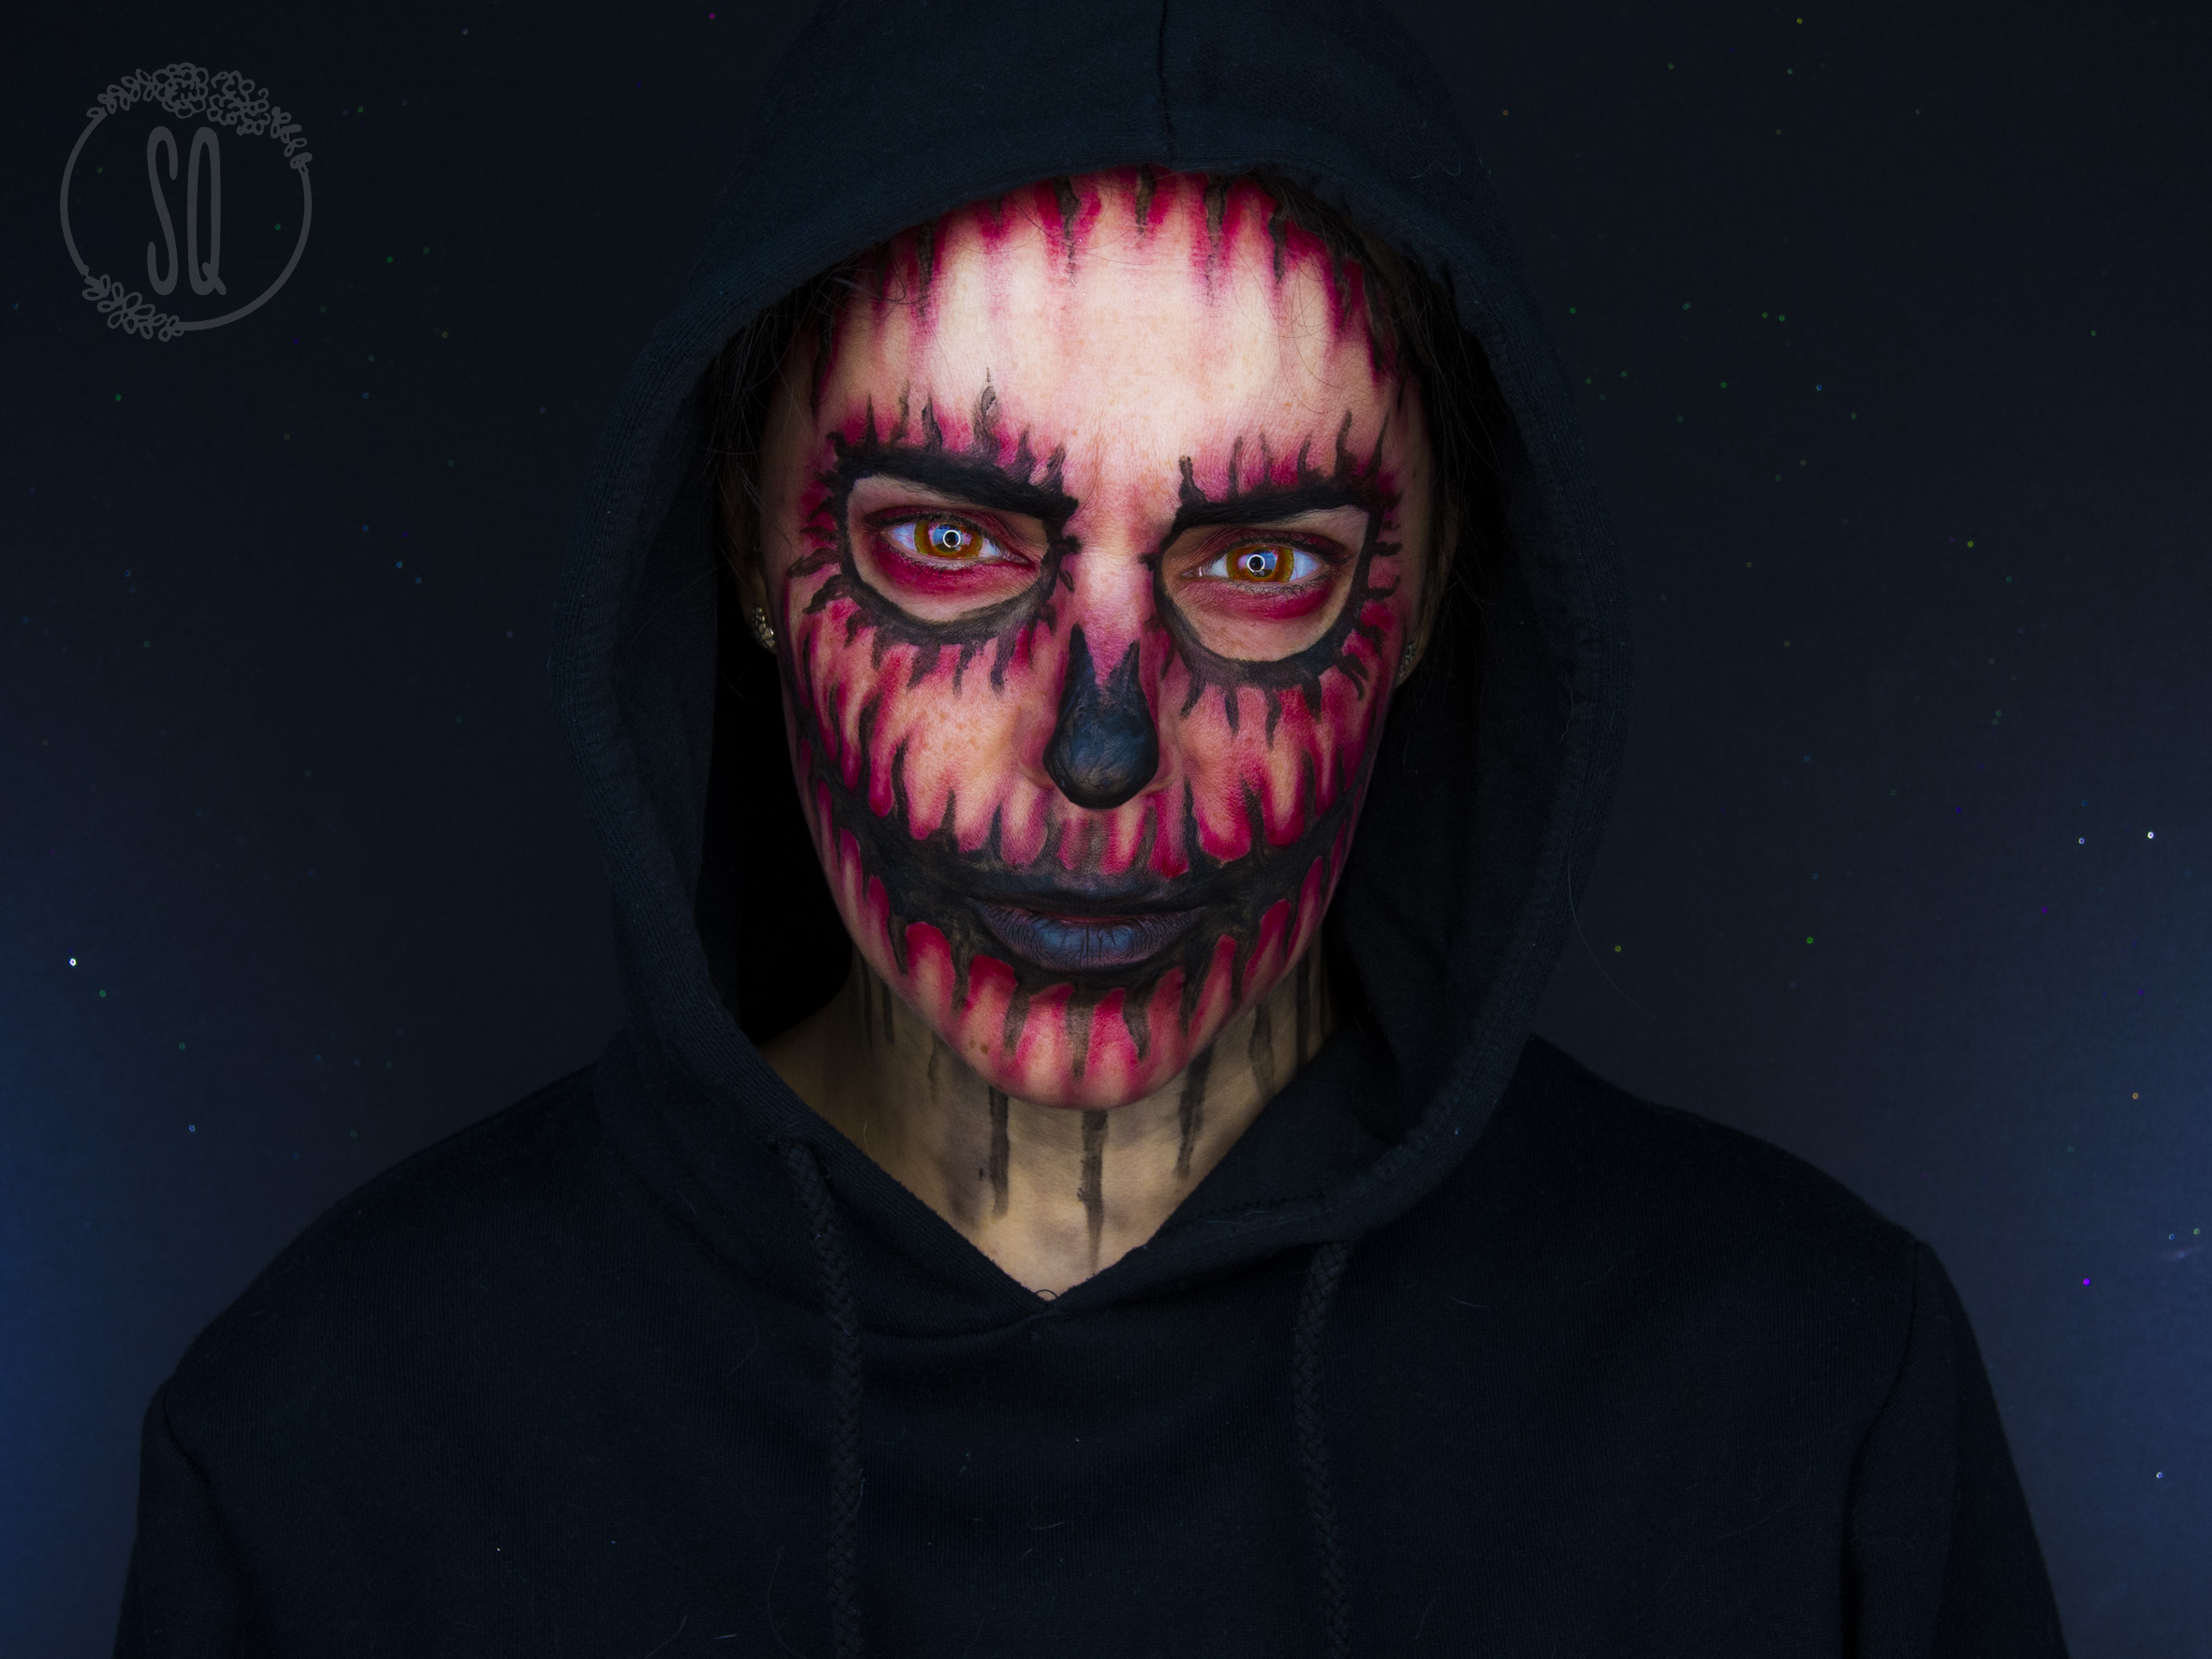 maquillaje calavera demonio para halloween - Maquillaje Demonio